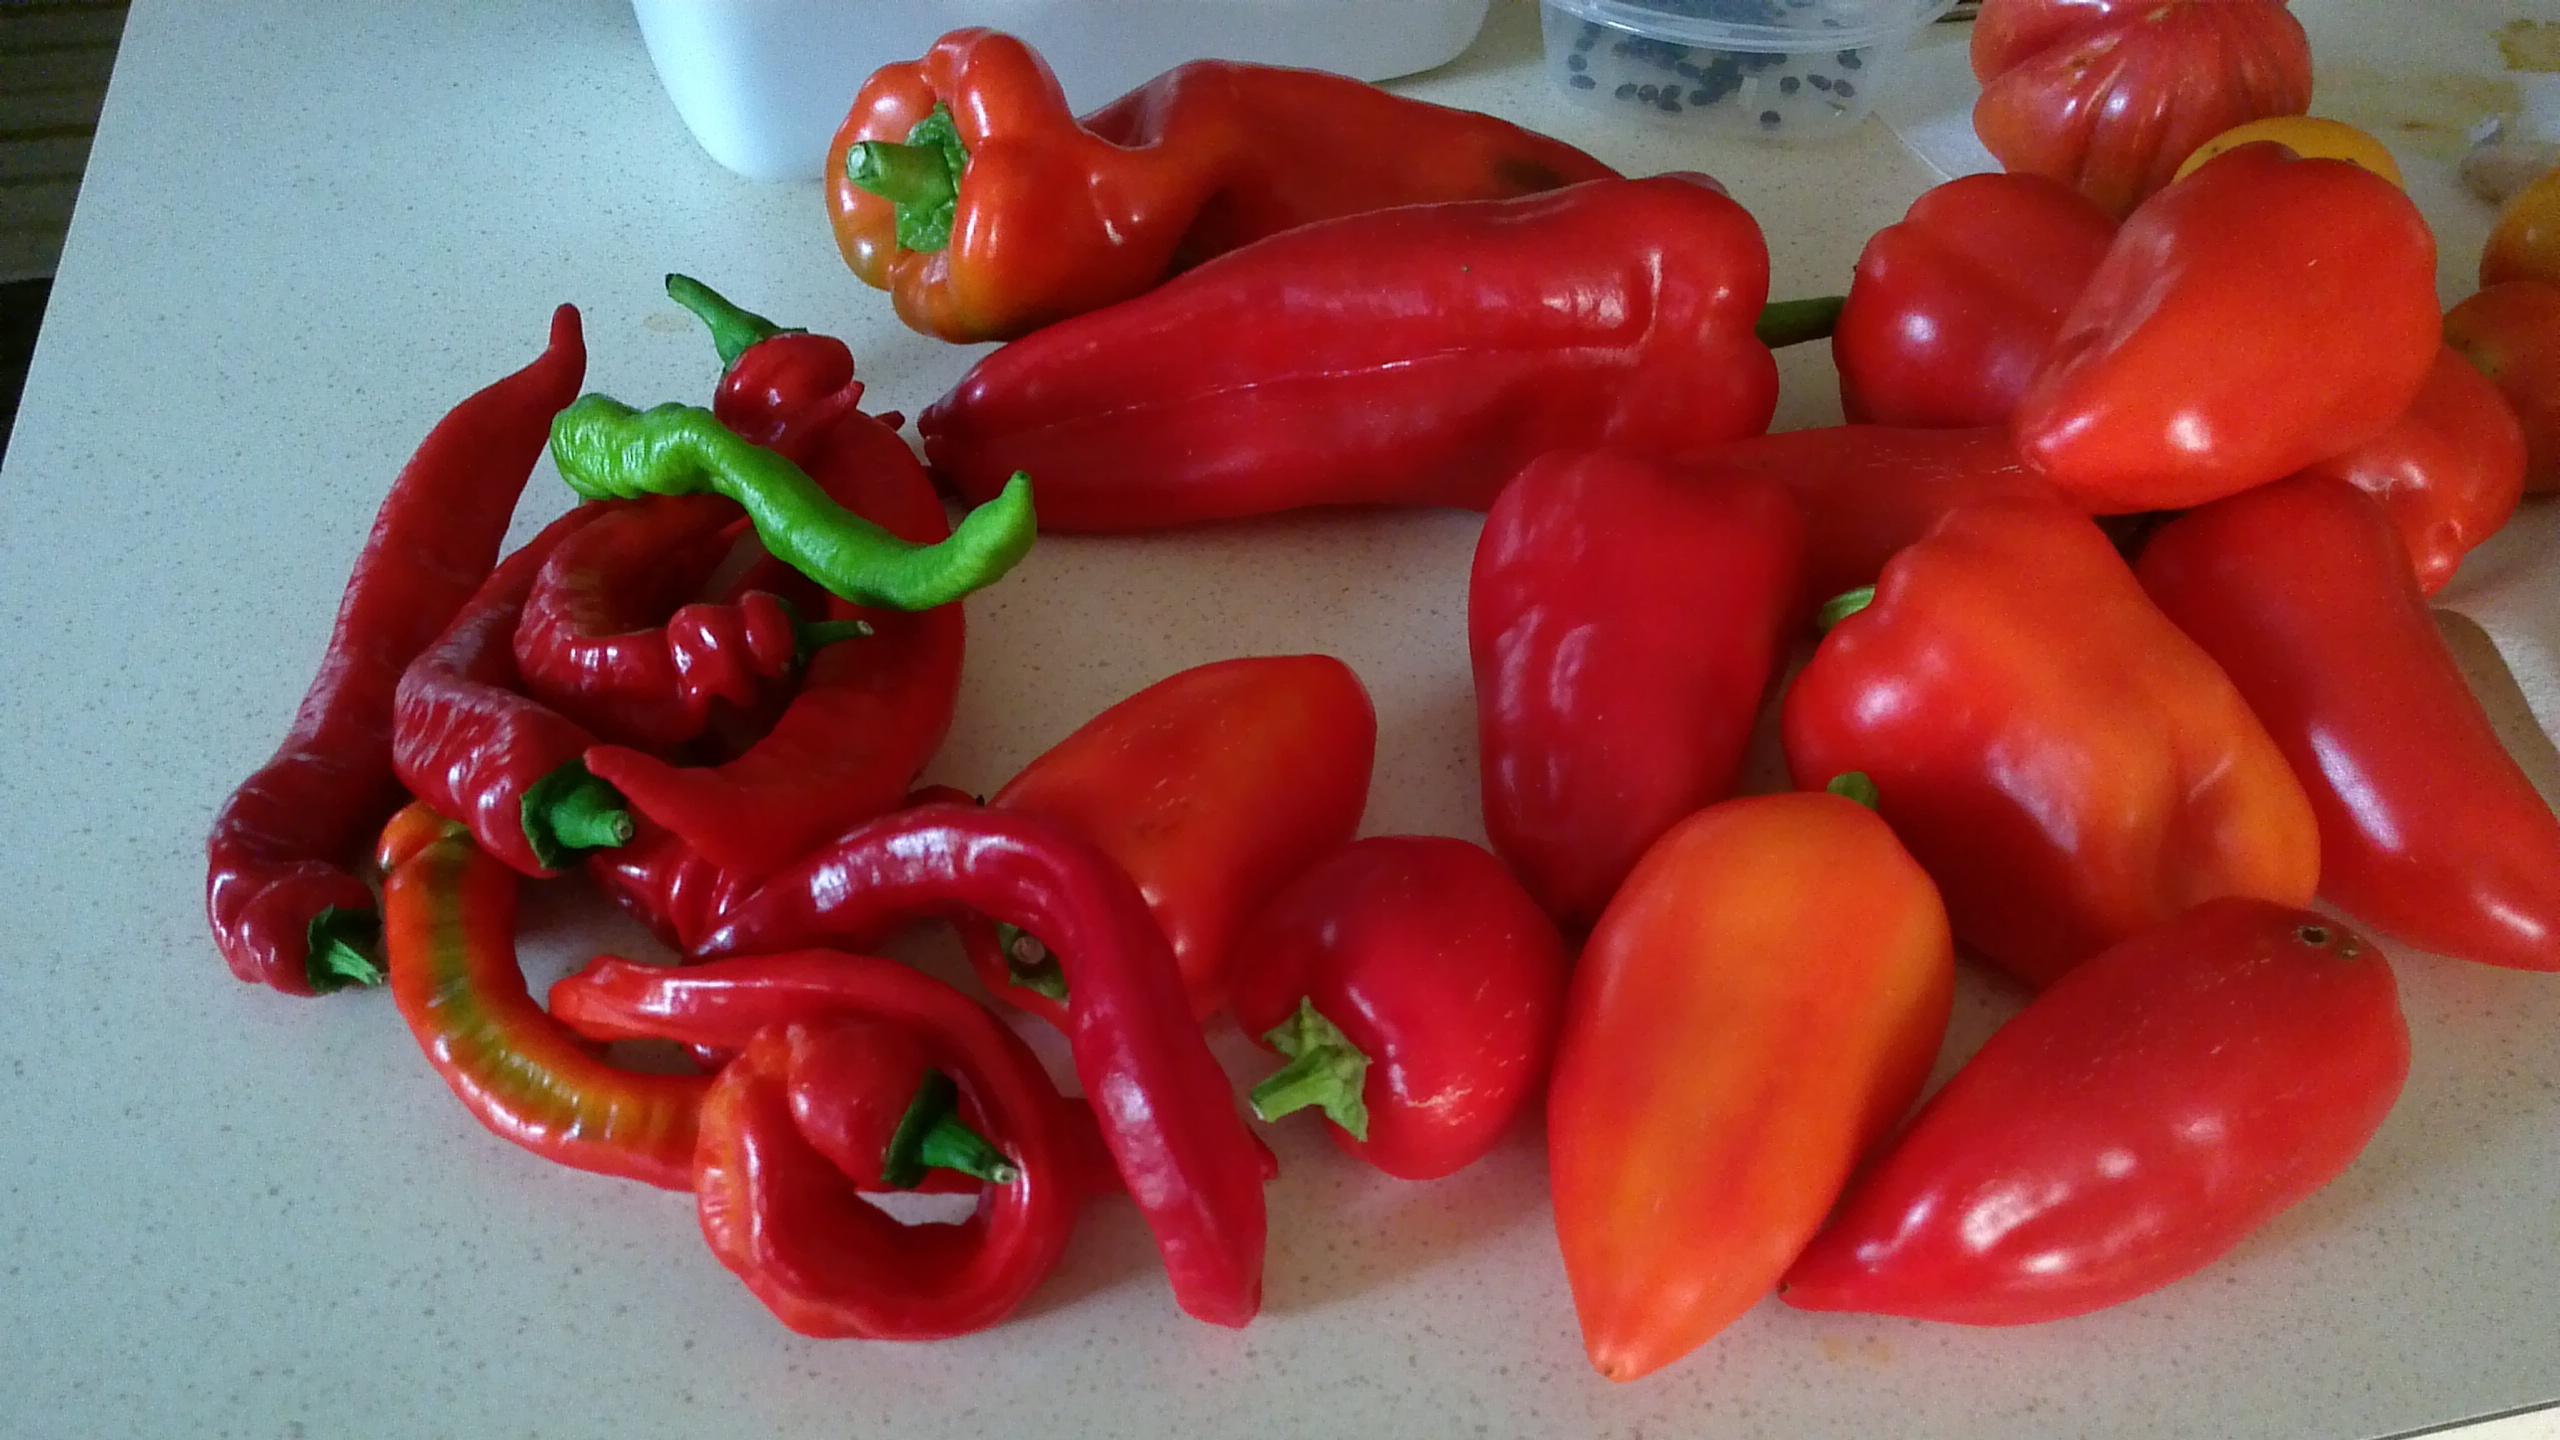 Your favorite pepper varieties general gardening - Best romanian pepper cultivars ...